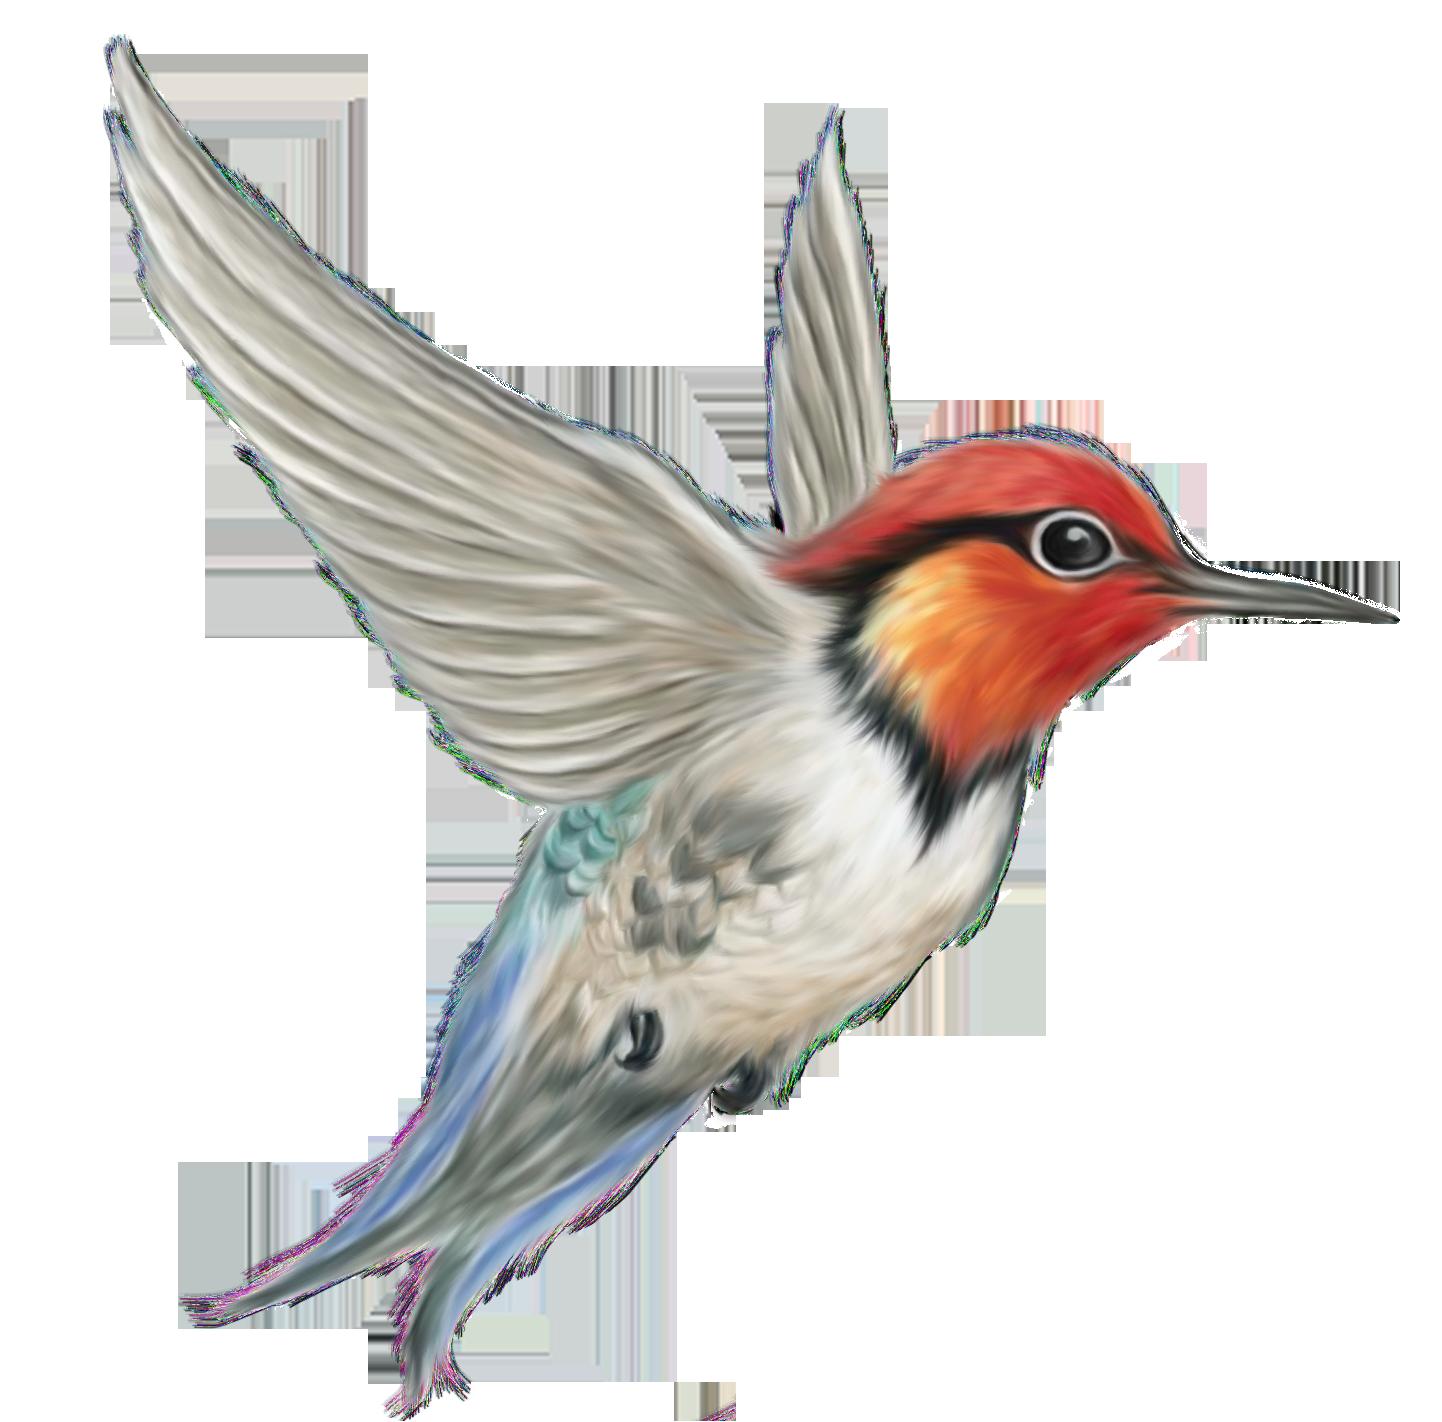 Image Result For Birds Png Bird Clipart Vintage Birds Animal Illustration Art